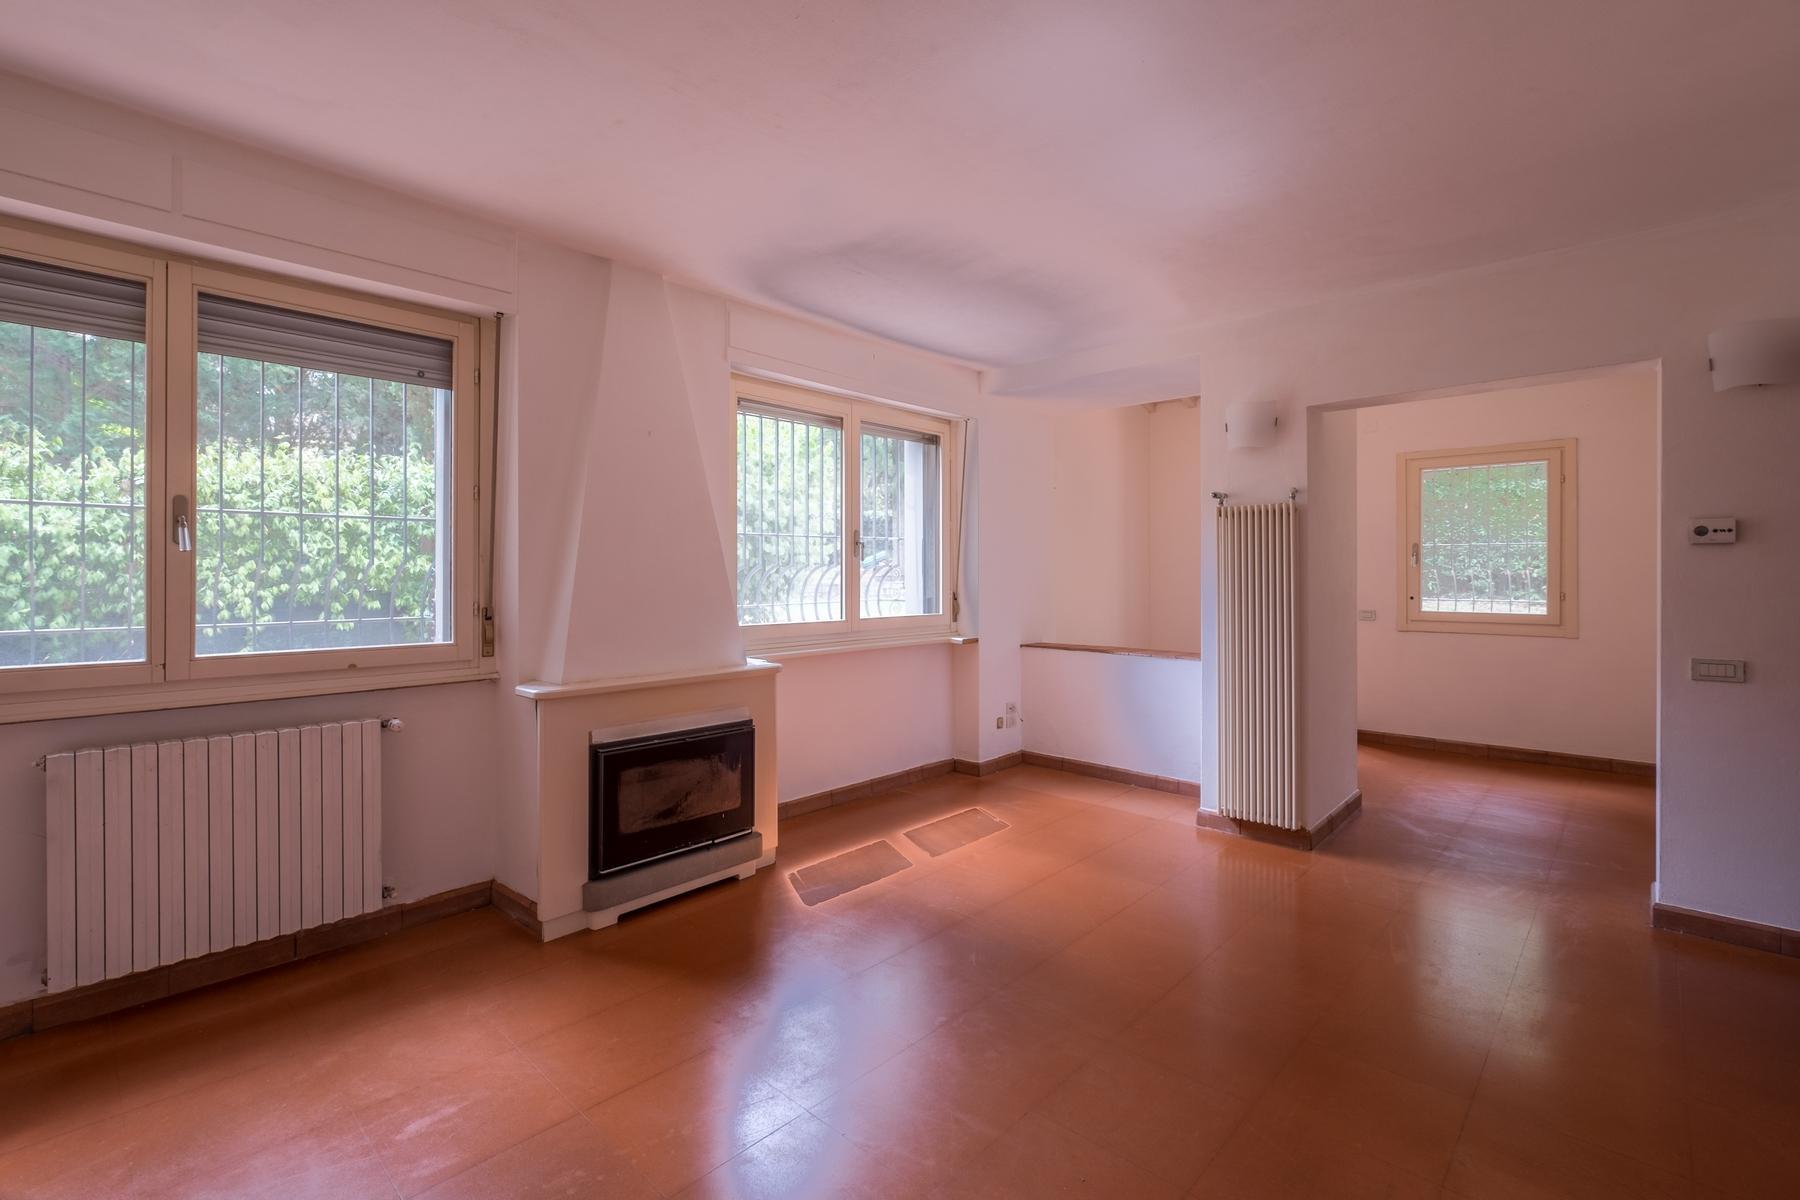 Schöne Wohnung in Poggio Imperiale - 7